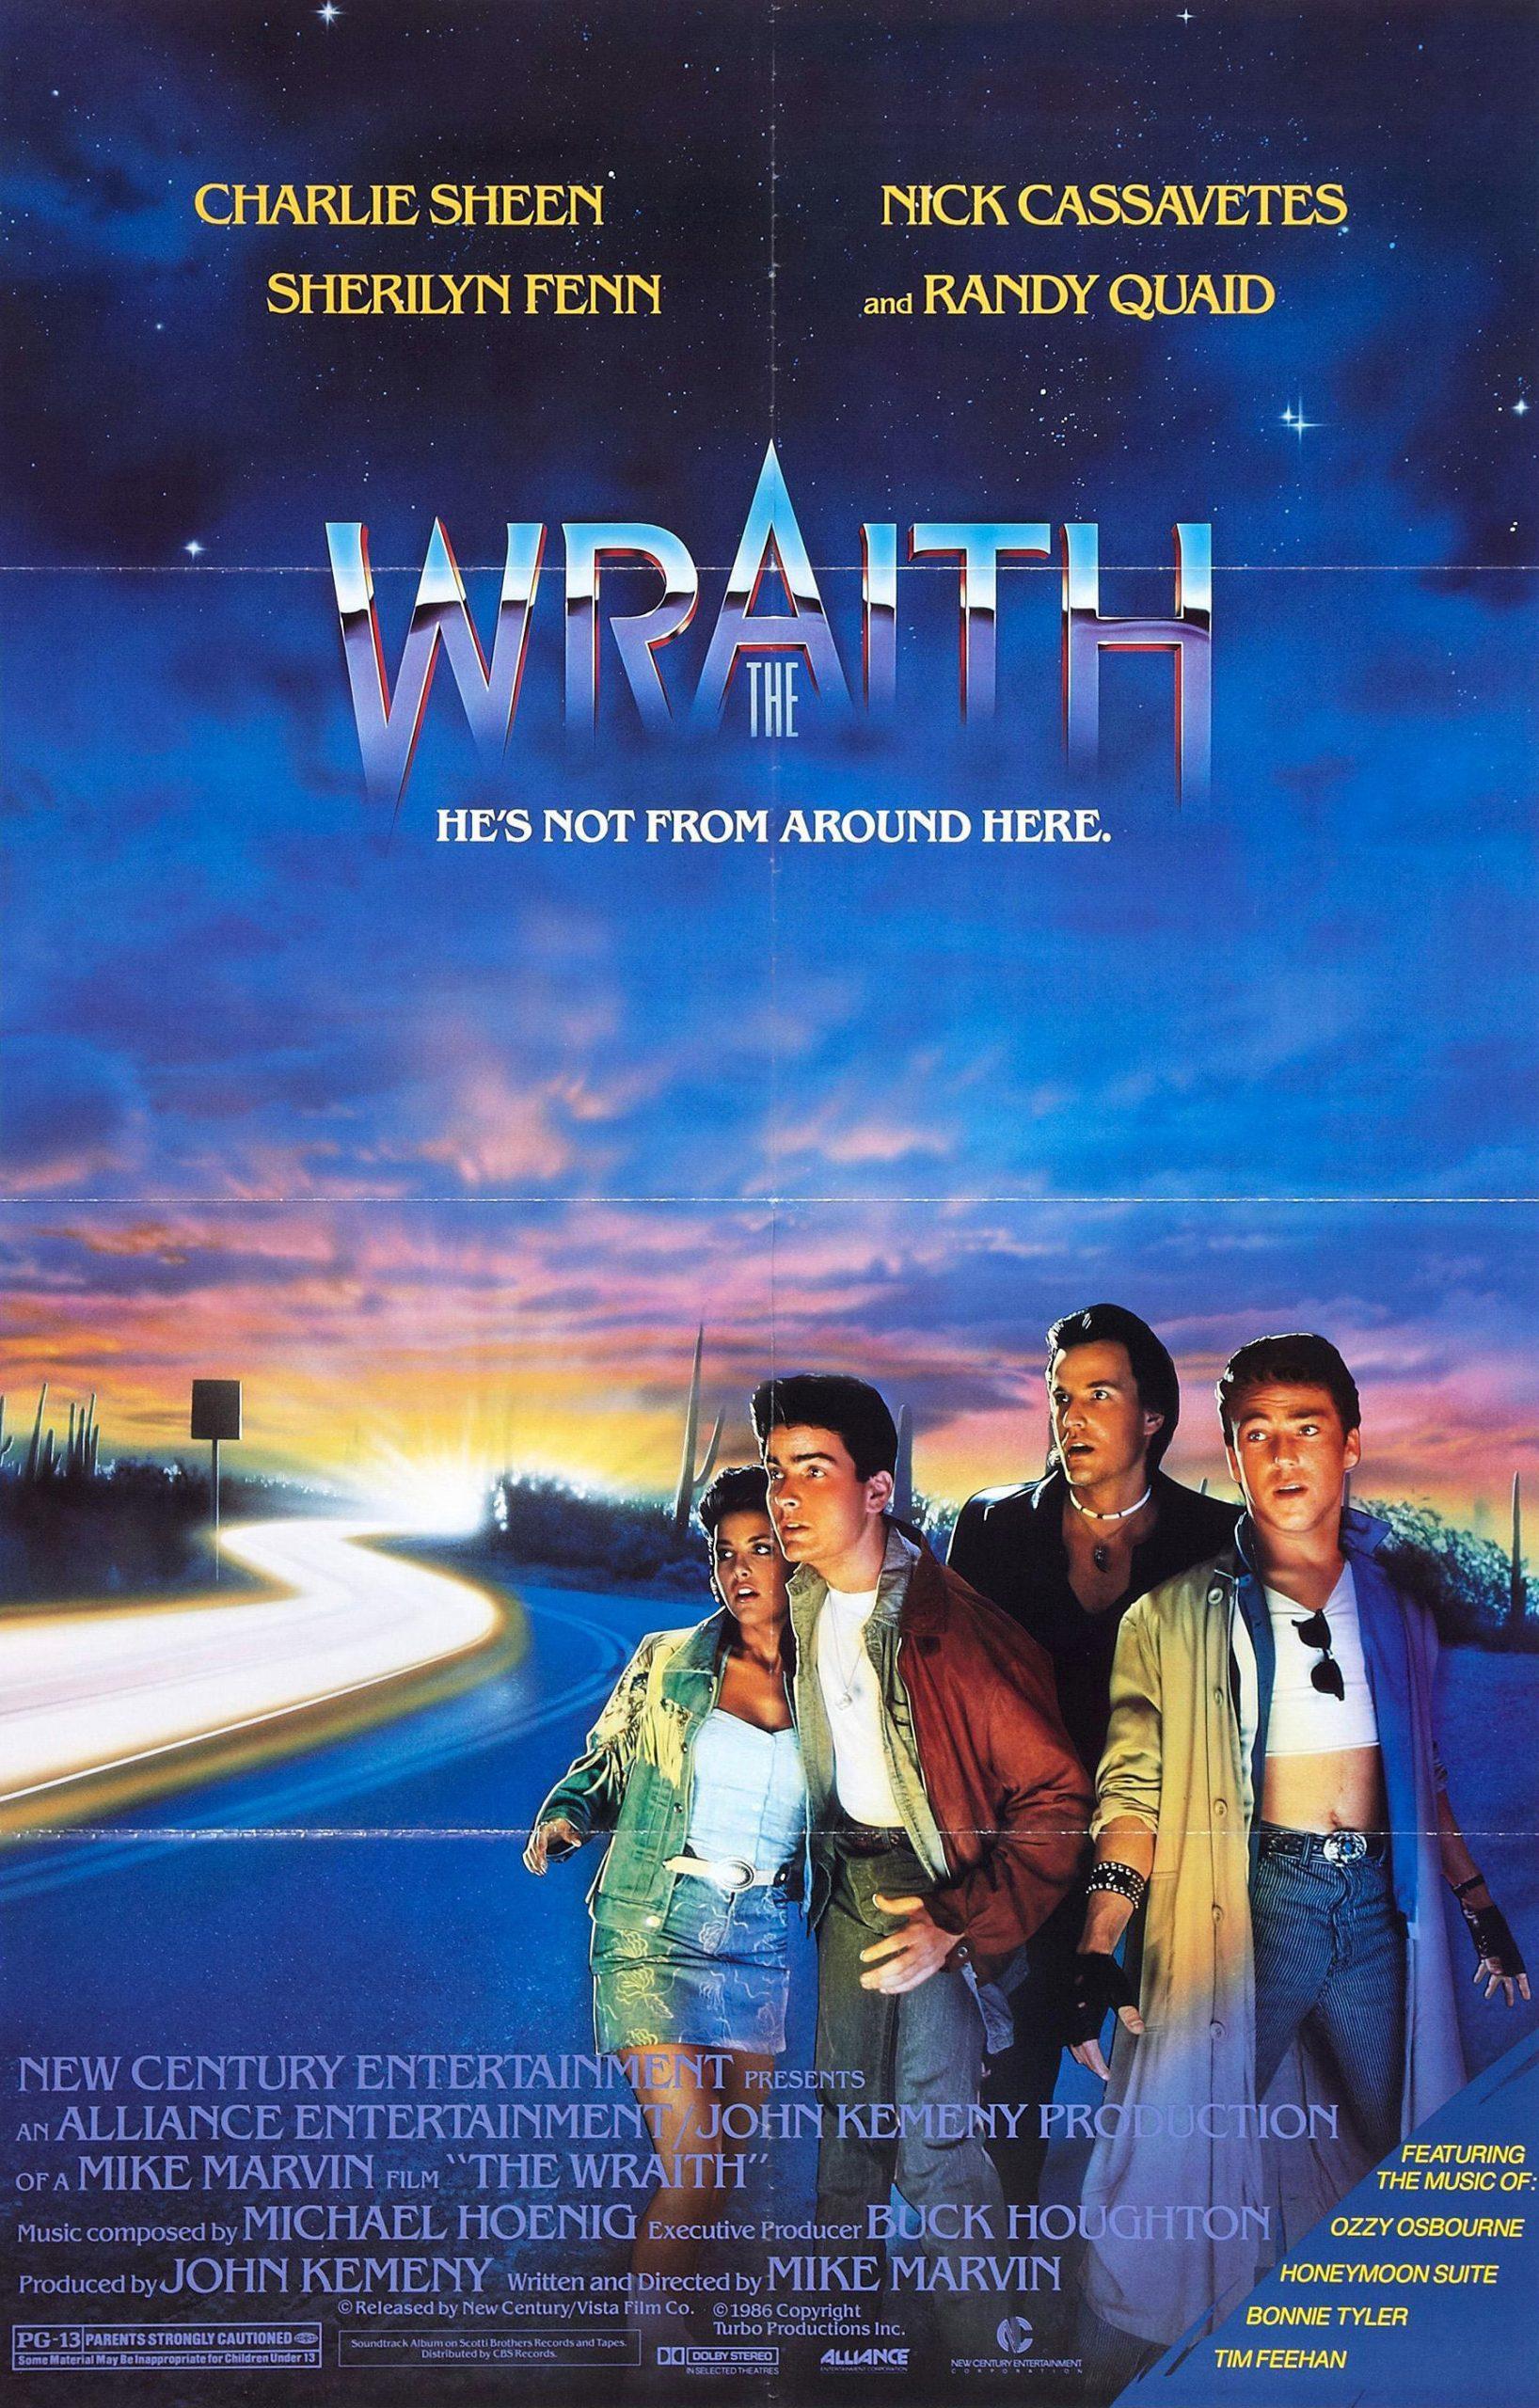 Where Was The Wraith Filmed